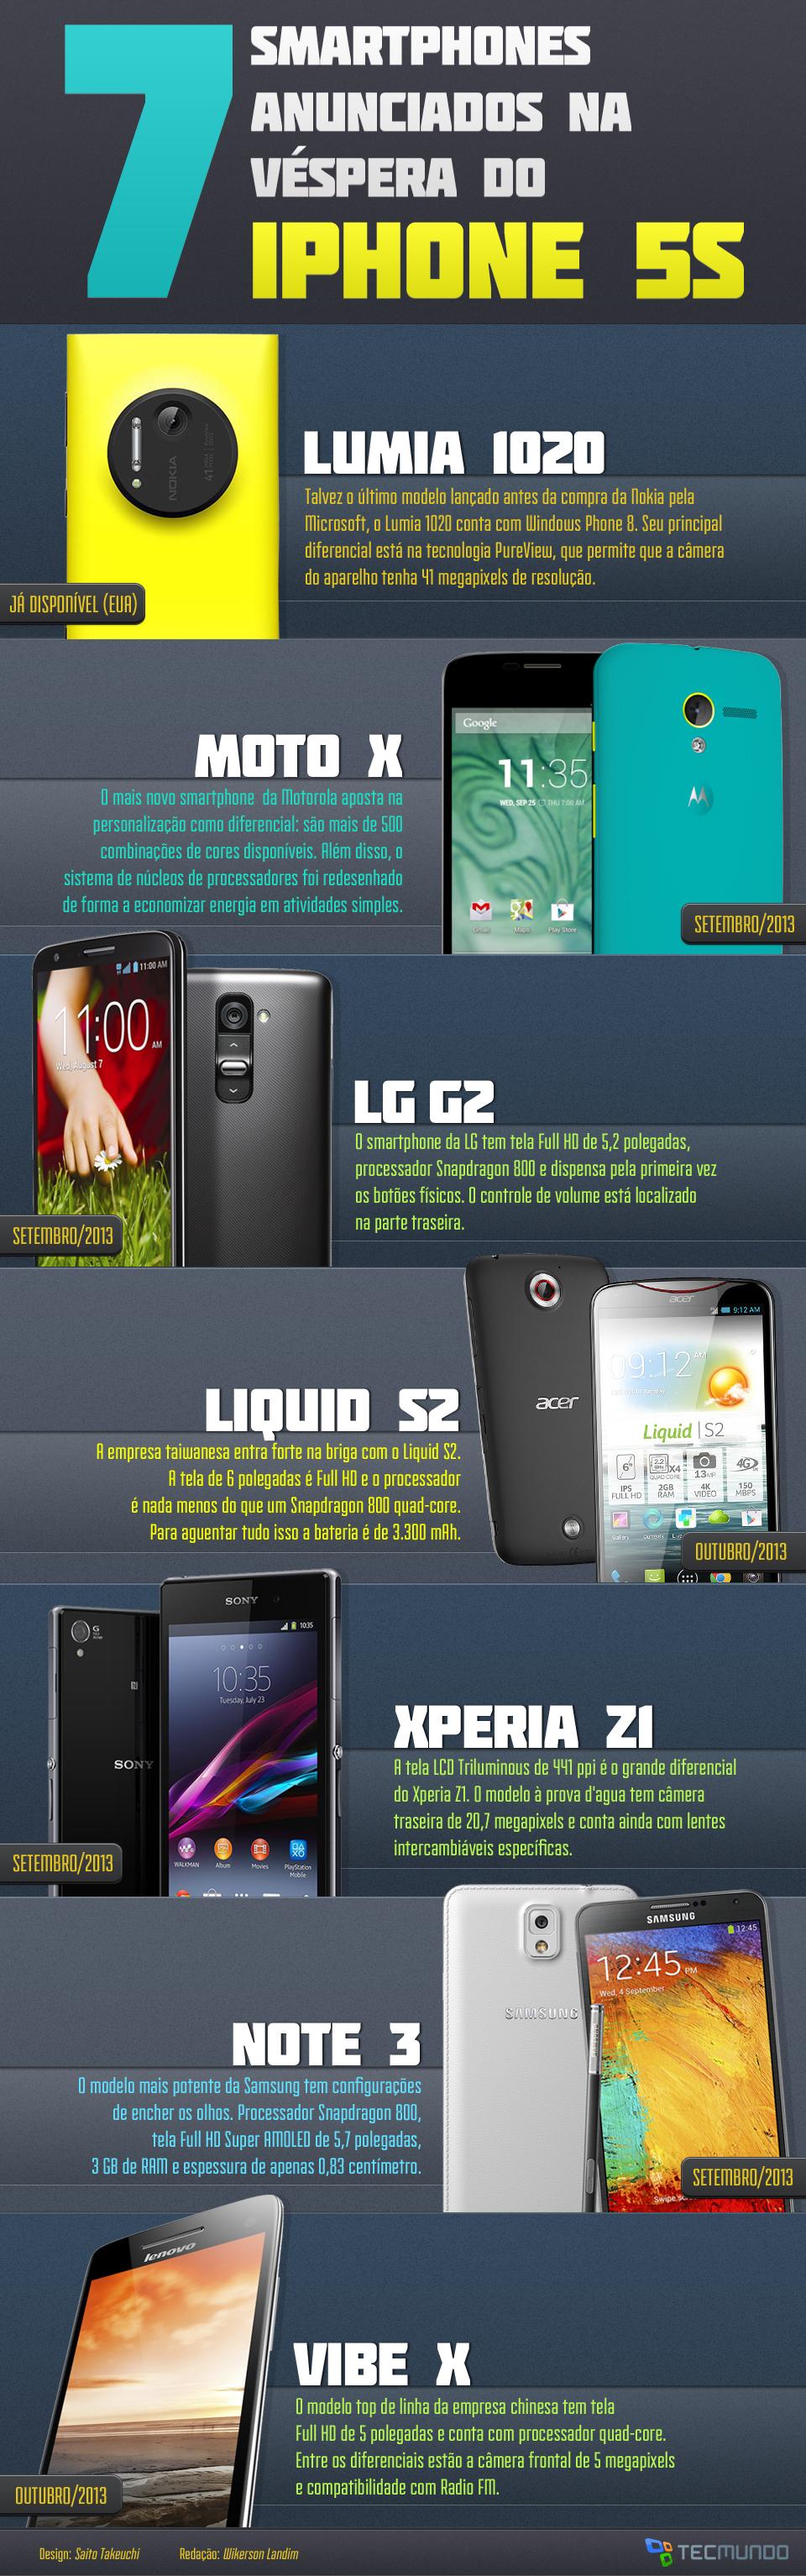 7 smartphones anunciados na véspera do iPhone 5S